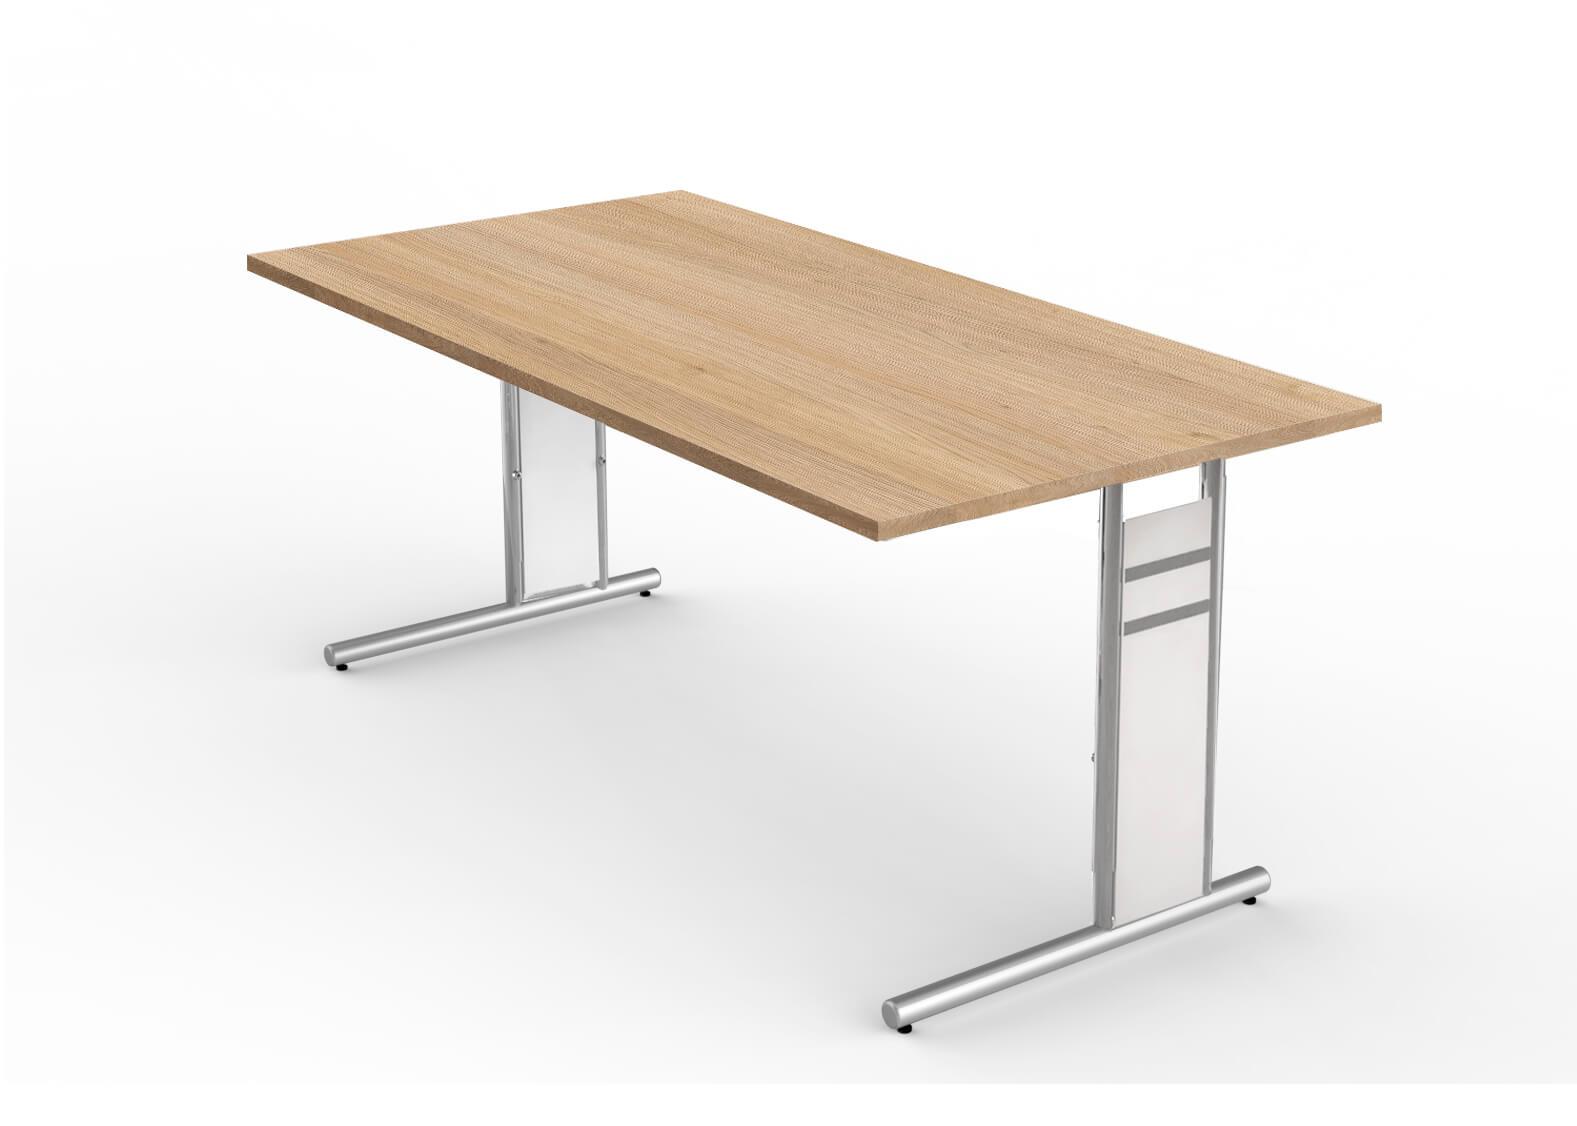 Schreibtisch neapel b rom bel for Schreibtisch gestell